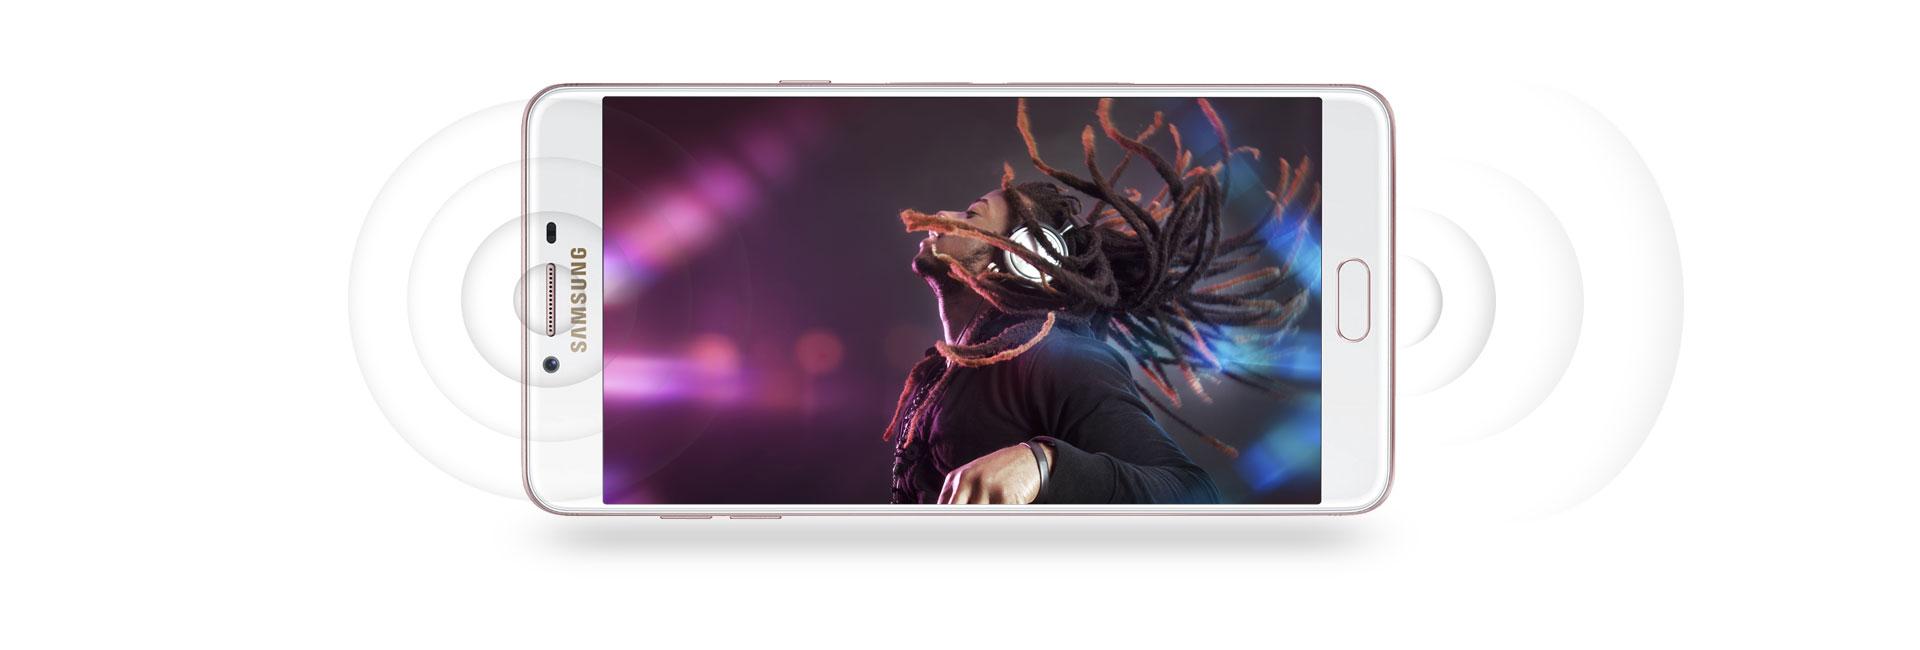 Samsung-Galaxy-C9-Pro-1